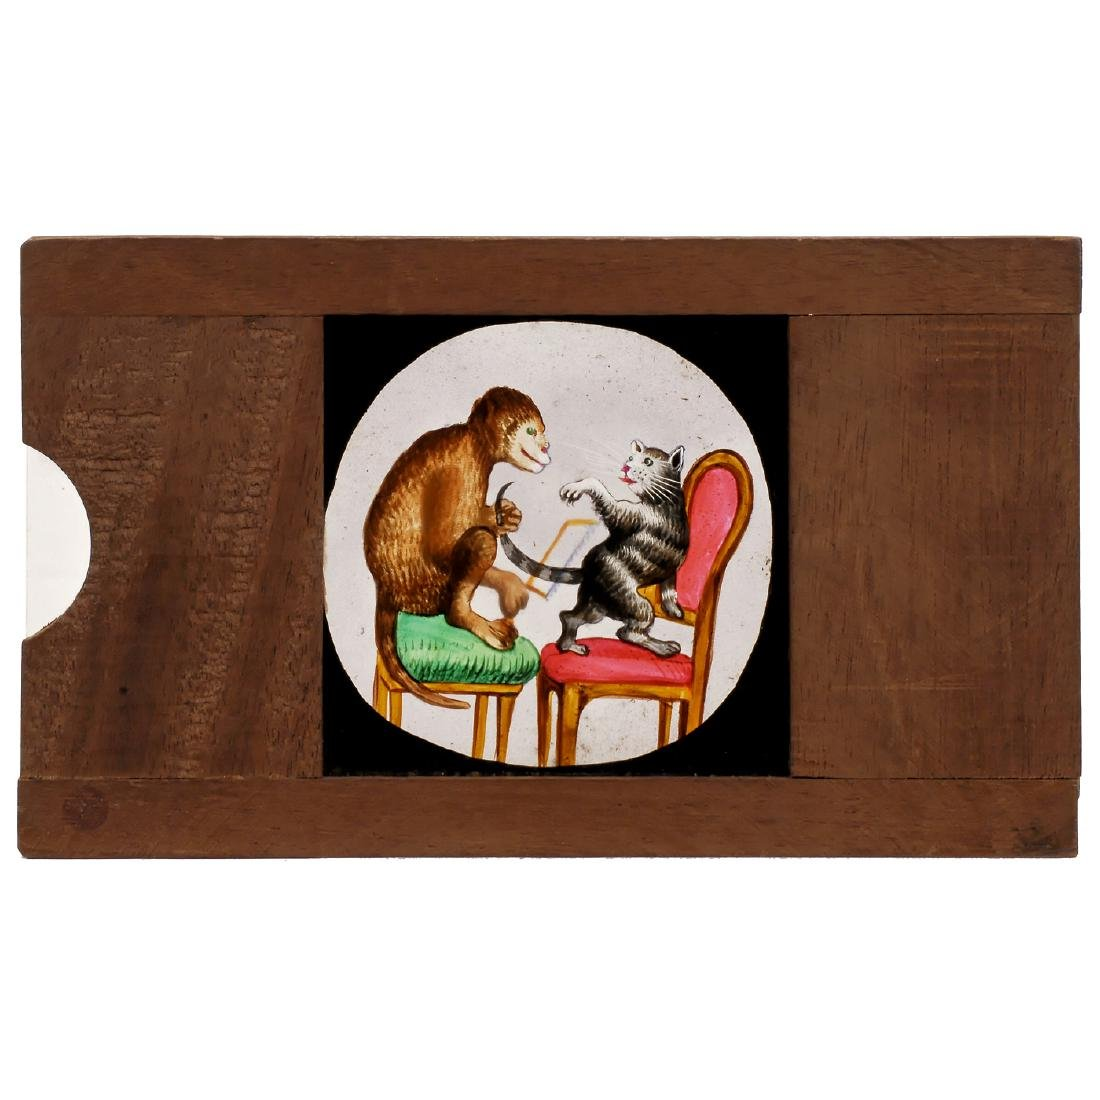 Single Rackwork Slide: Monkey and Cat, c. 1870-80